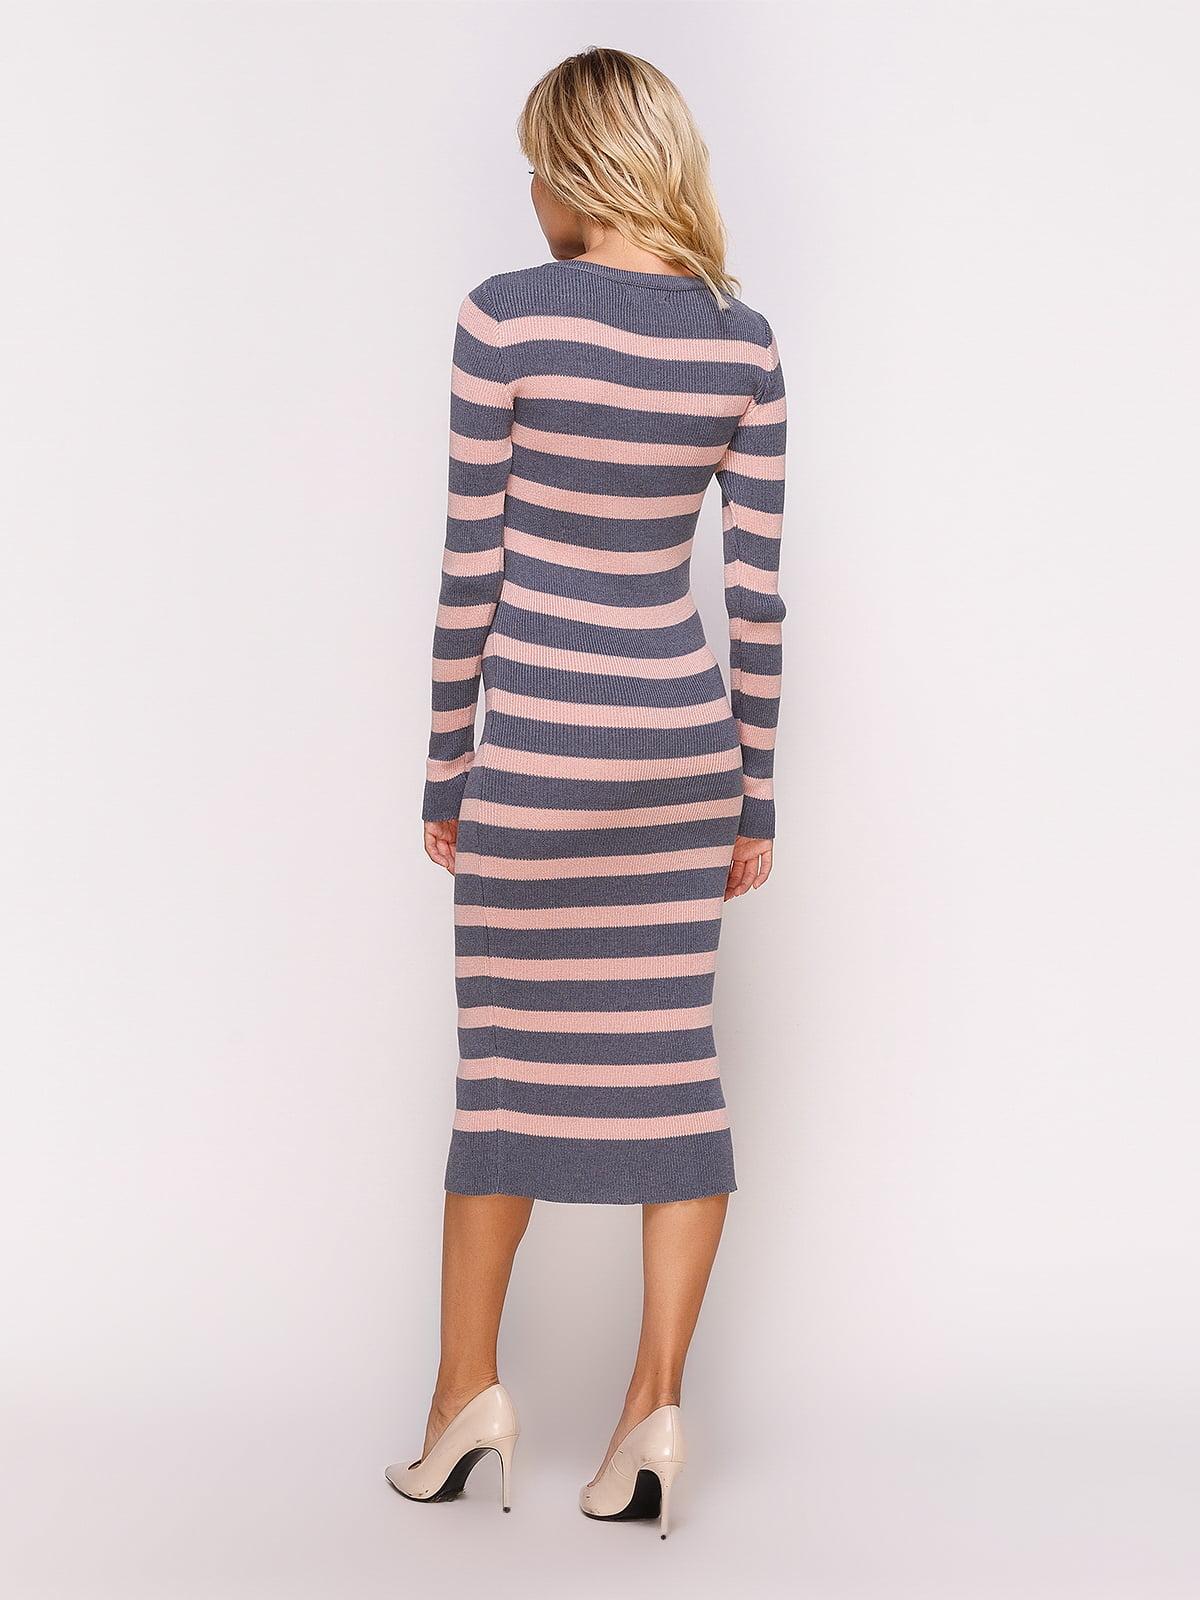 Сукня в смужку | 4567077 | фото 2